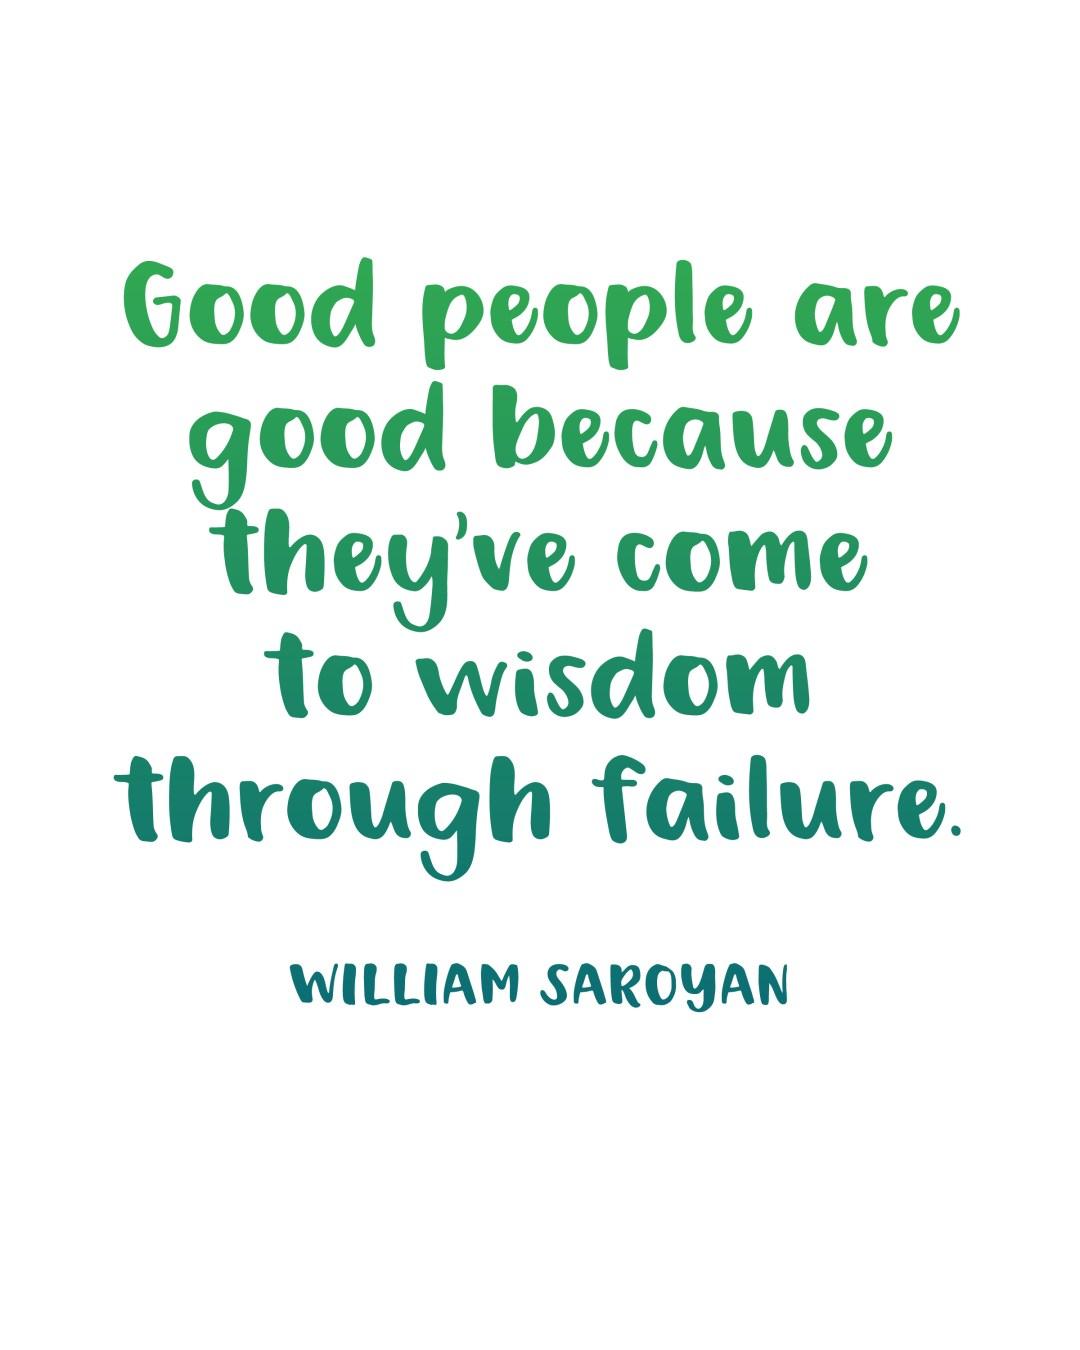 Life Wisdom Quotes Printable Inspiration Wisdom Quotesaroyan  Random Olive